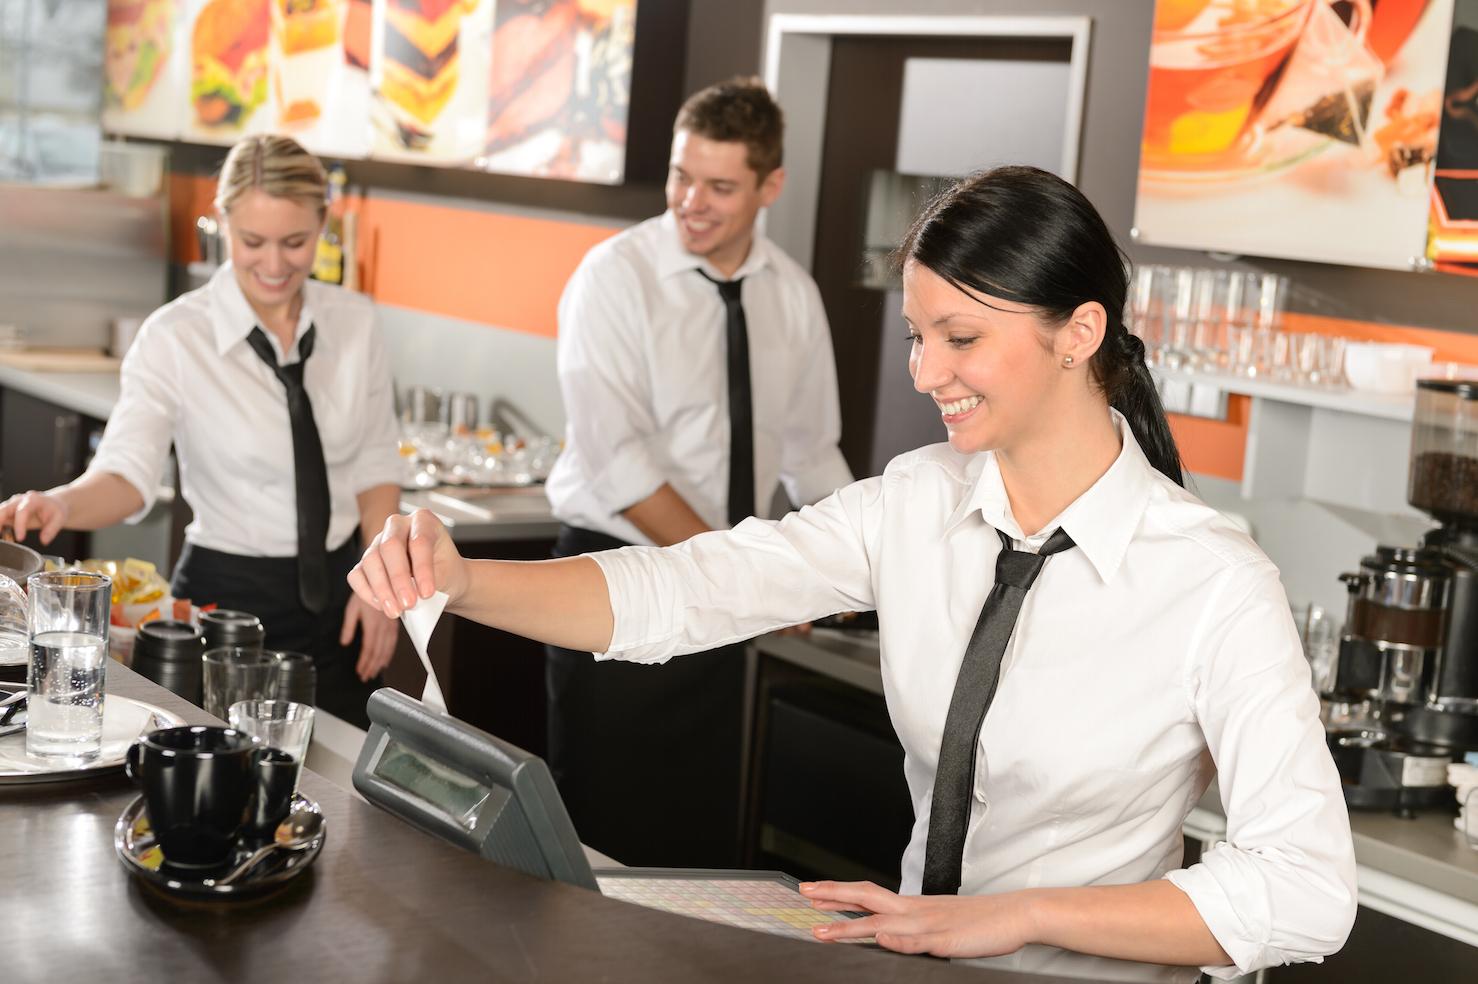 hospitality safety services